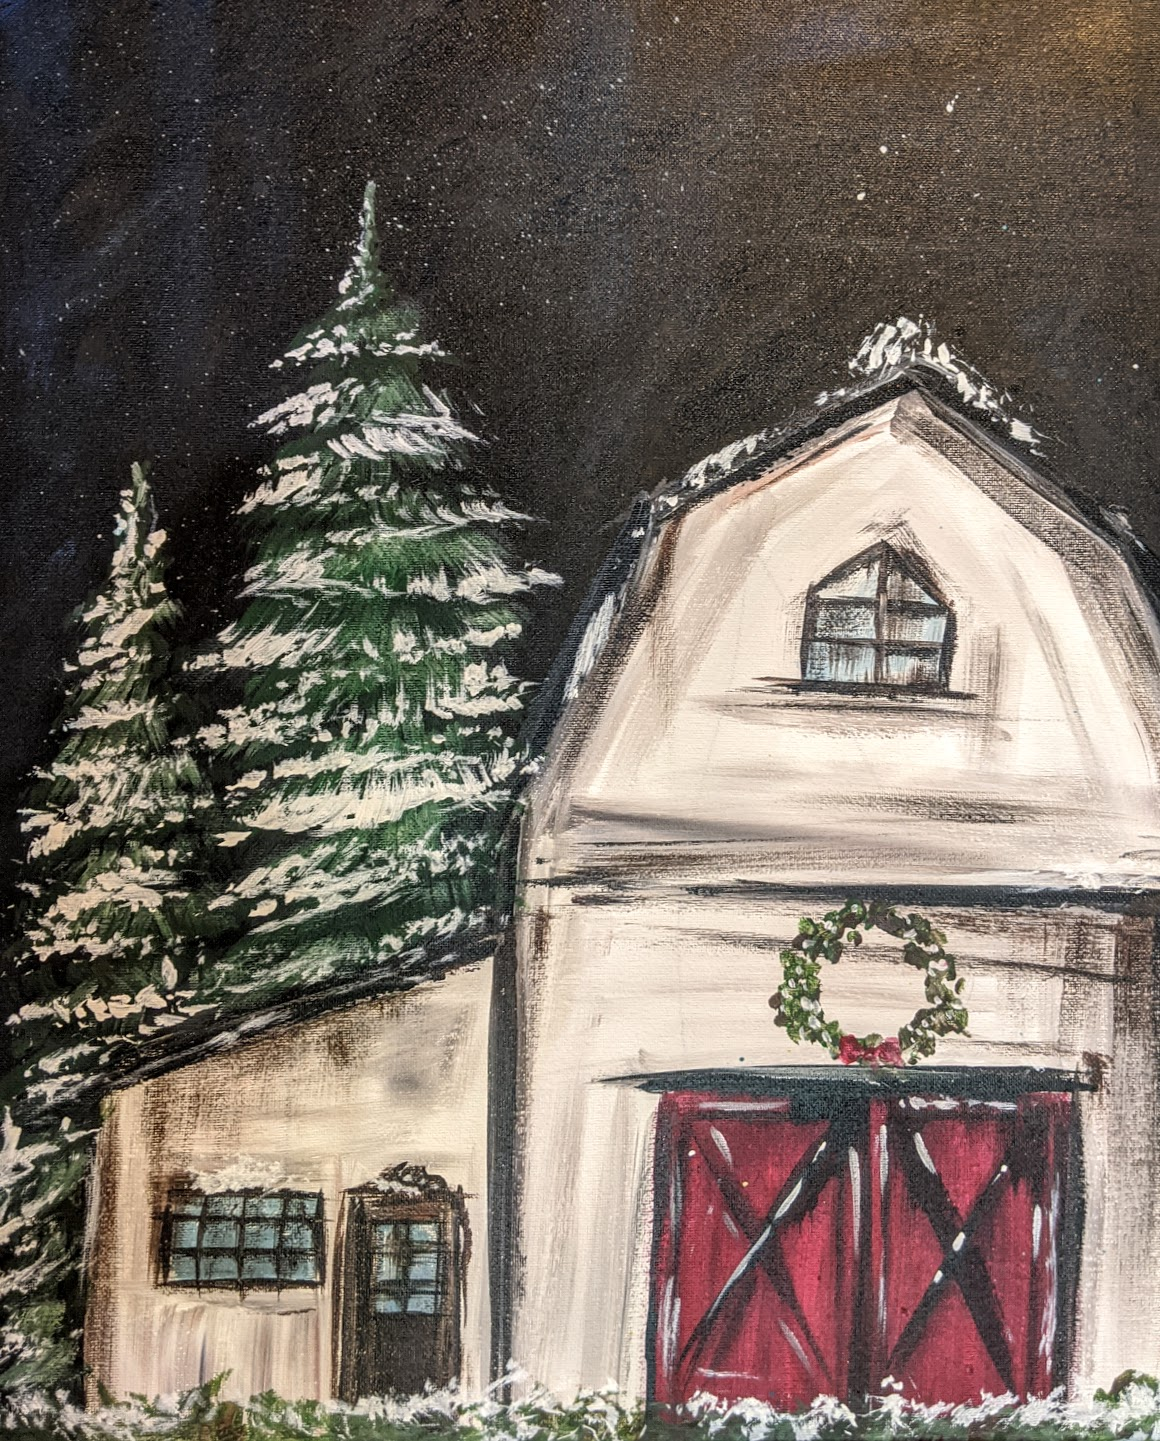 White Christmas Barn